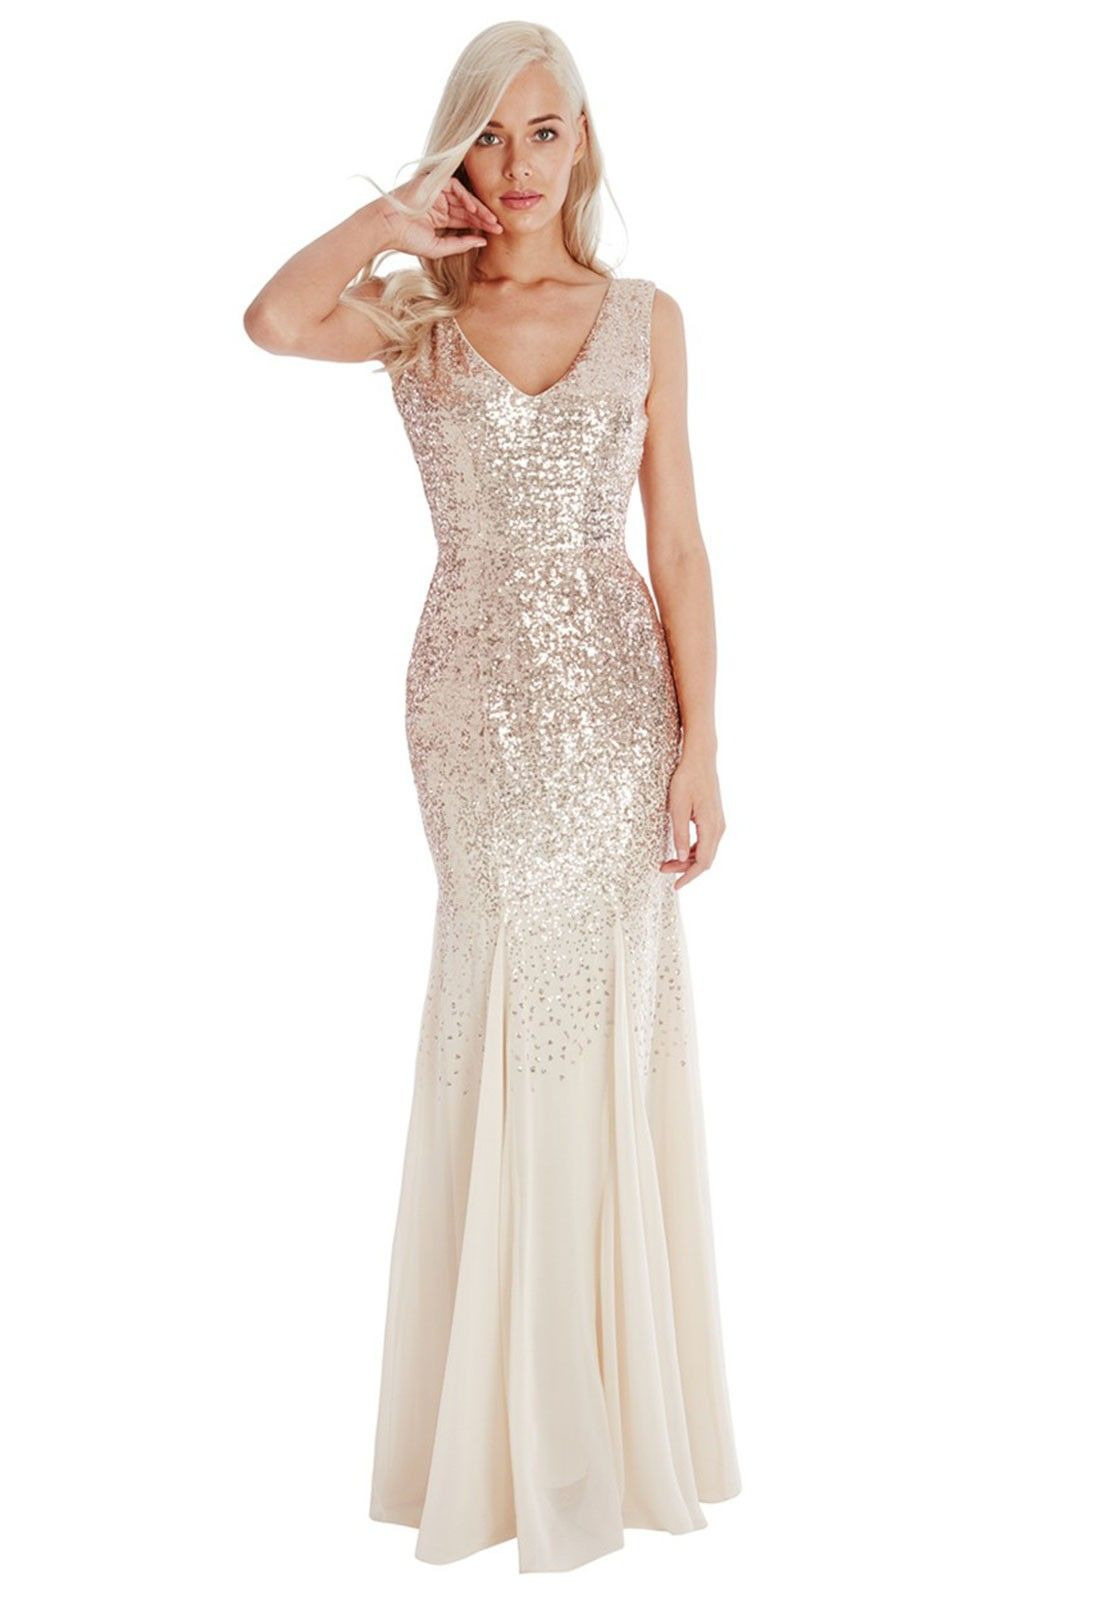 Goddiva Silver Sequin Chiffon Inserts Maxi Dress Prom Party Bridesmaid Ball Gown